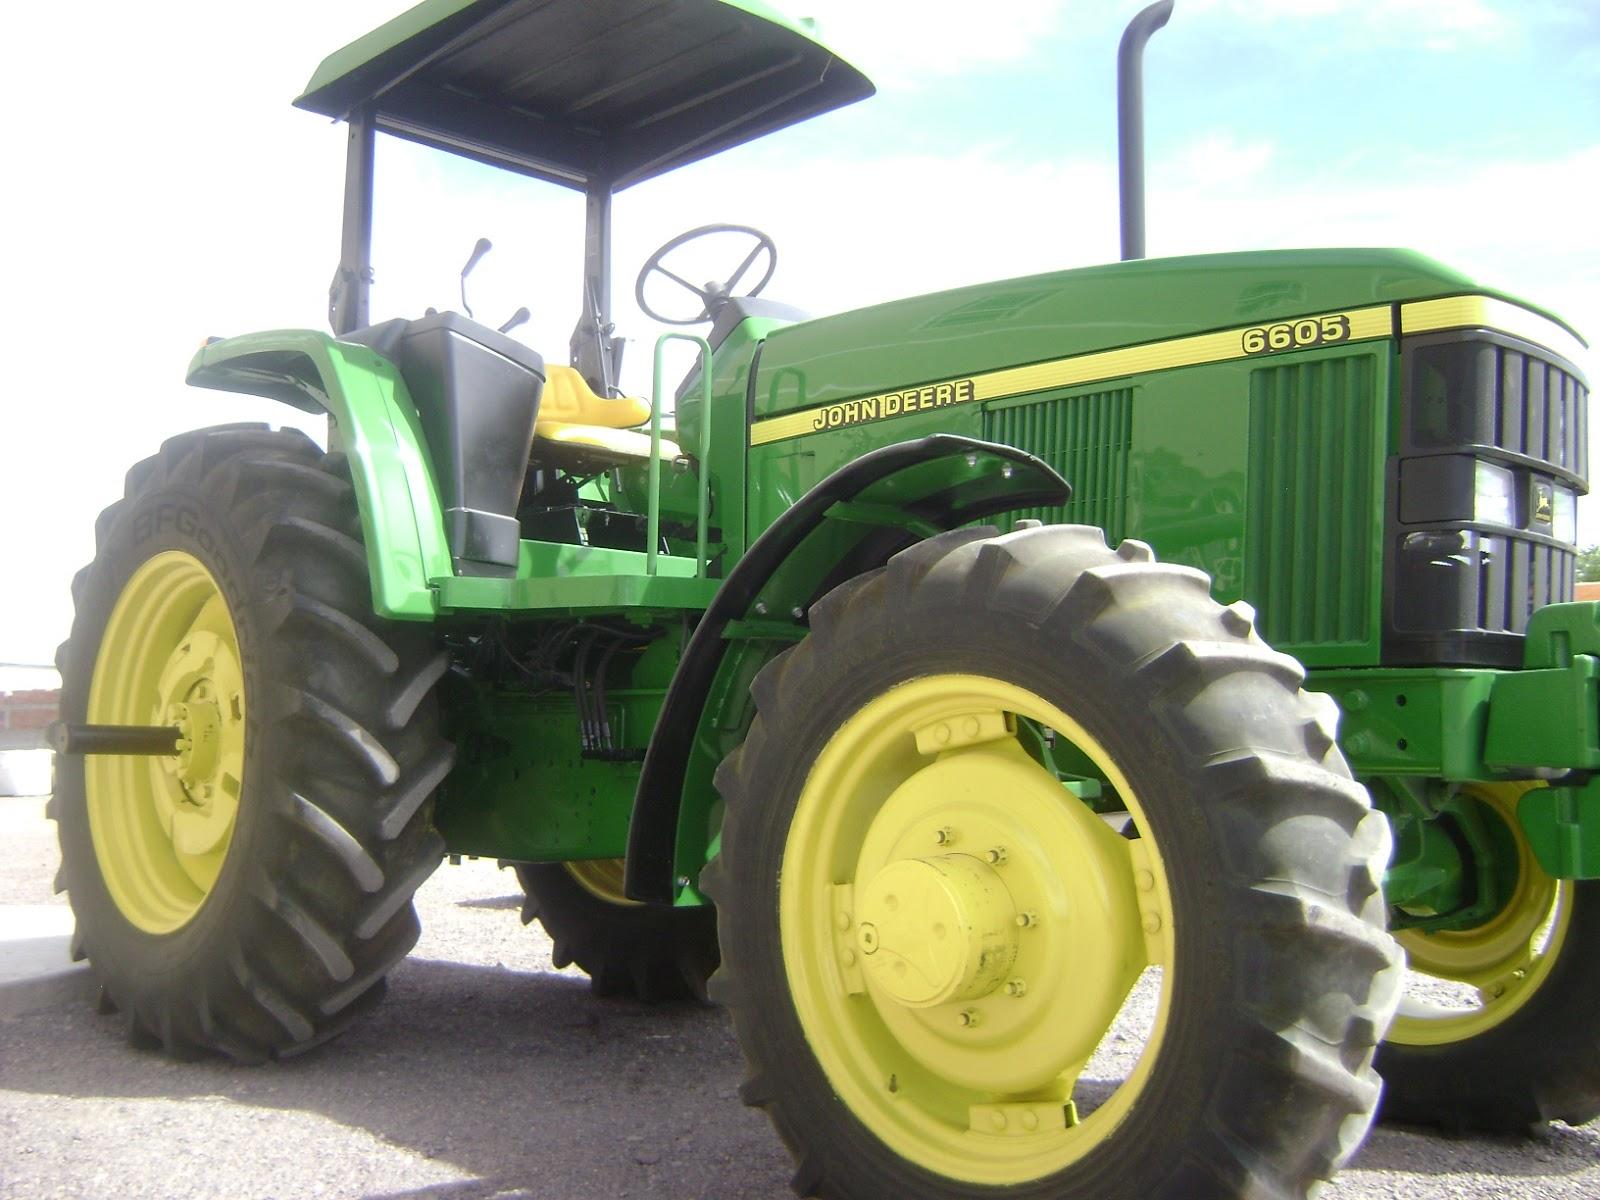 MAQUINARIA AGRICOLA INDUSTRIAL: Tractor John Deere 6605 ...